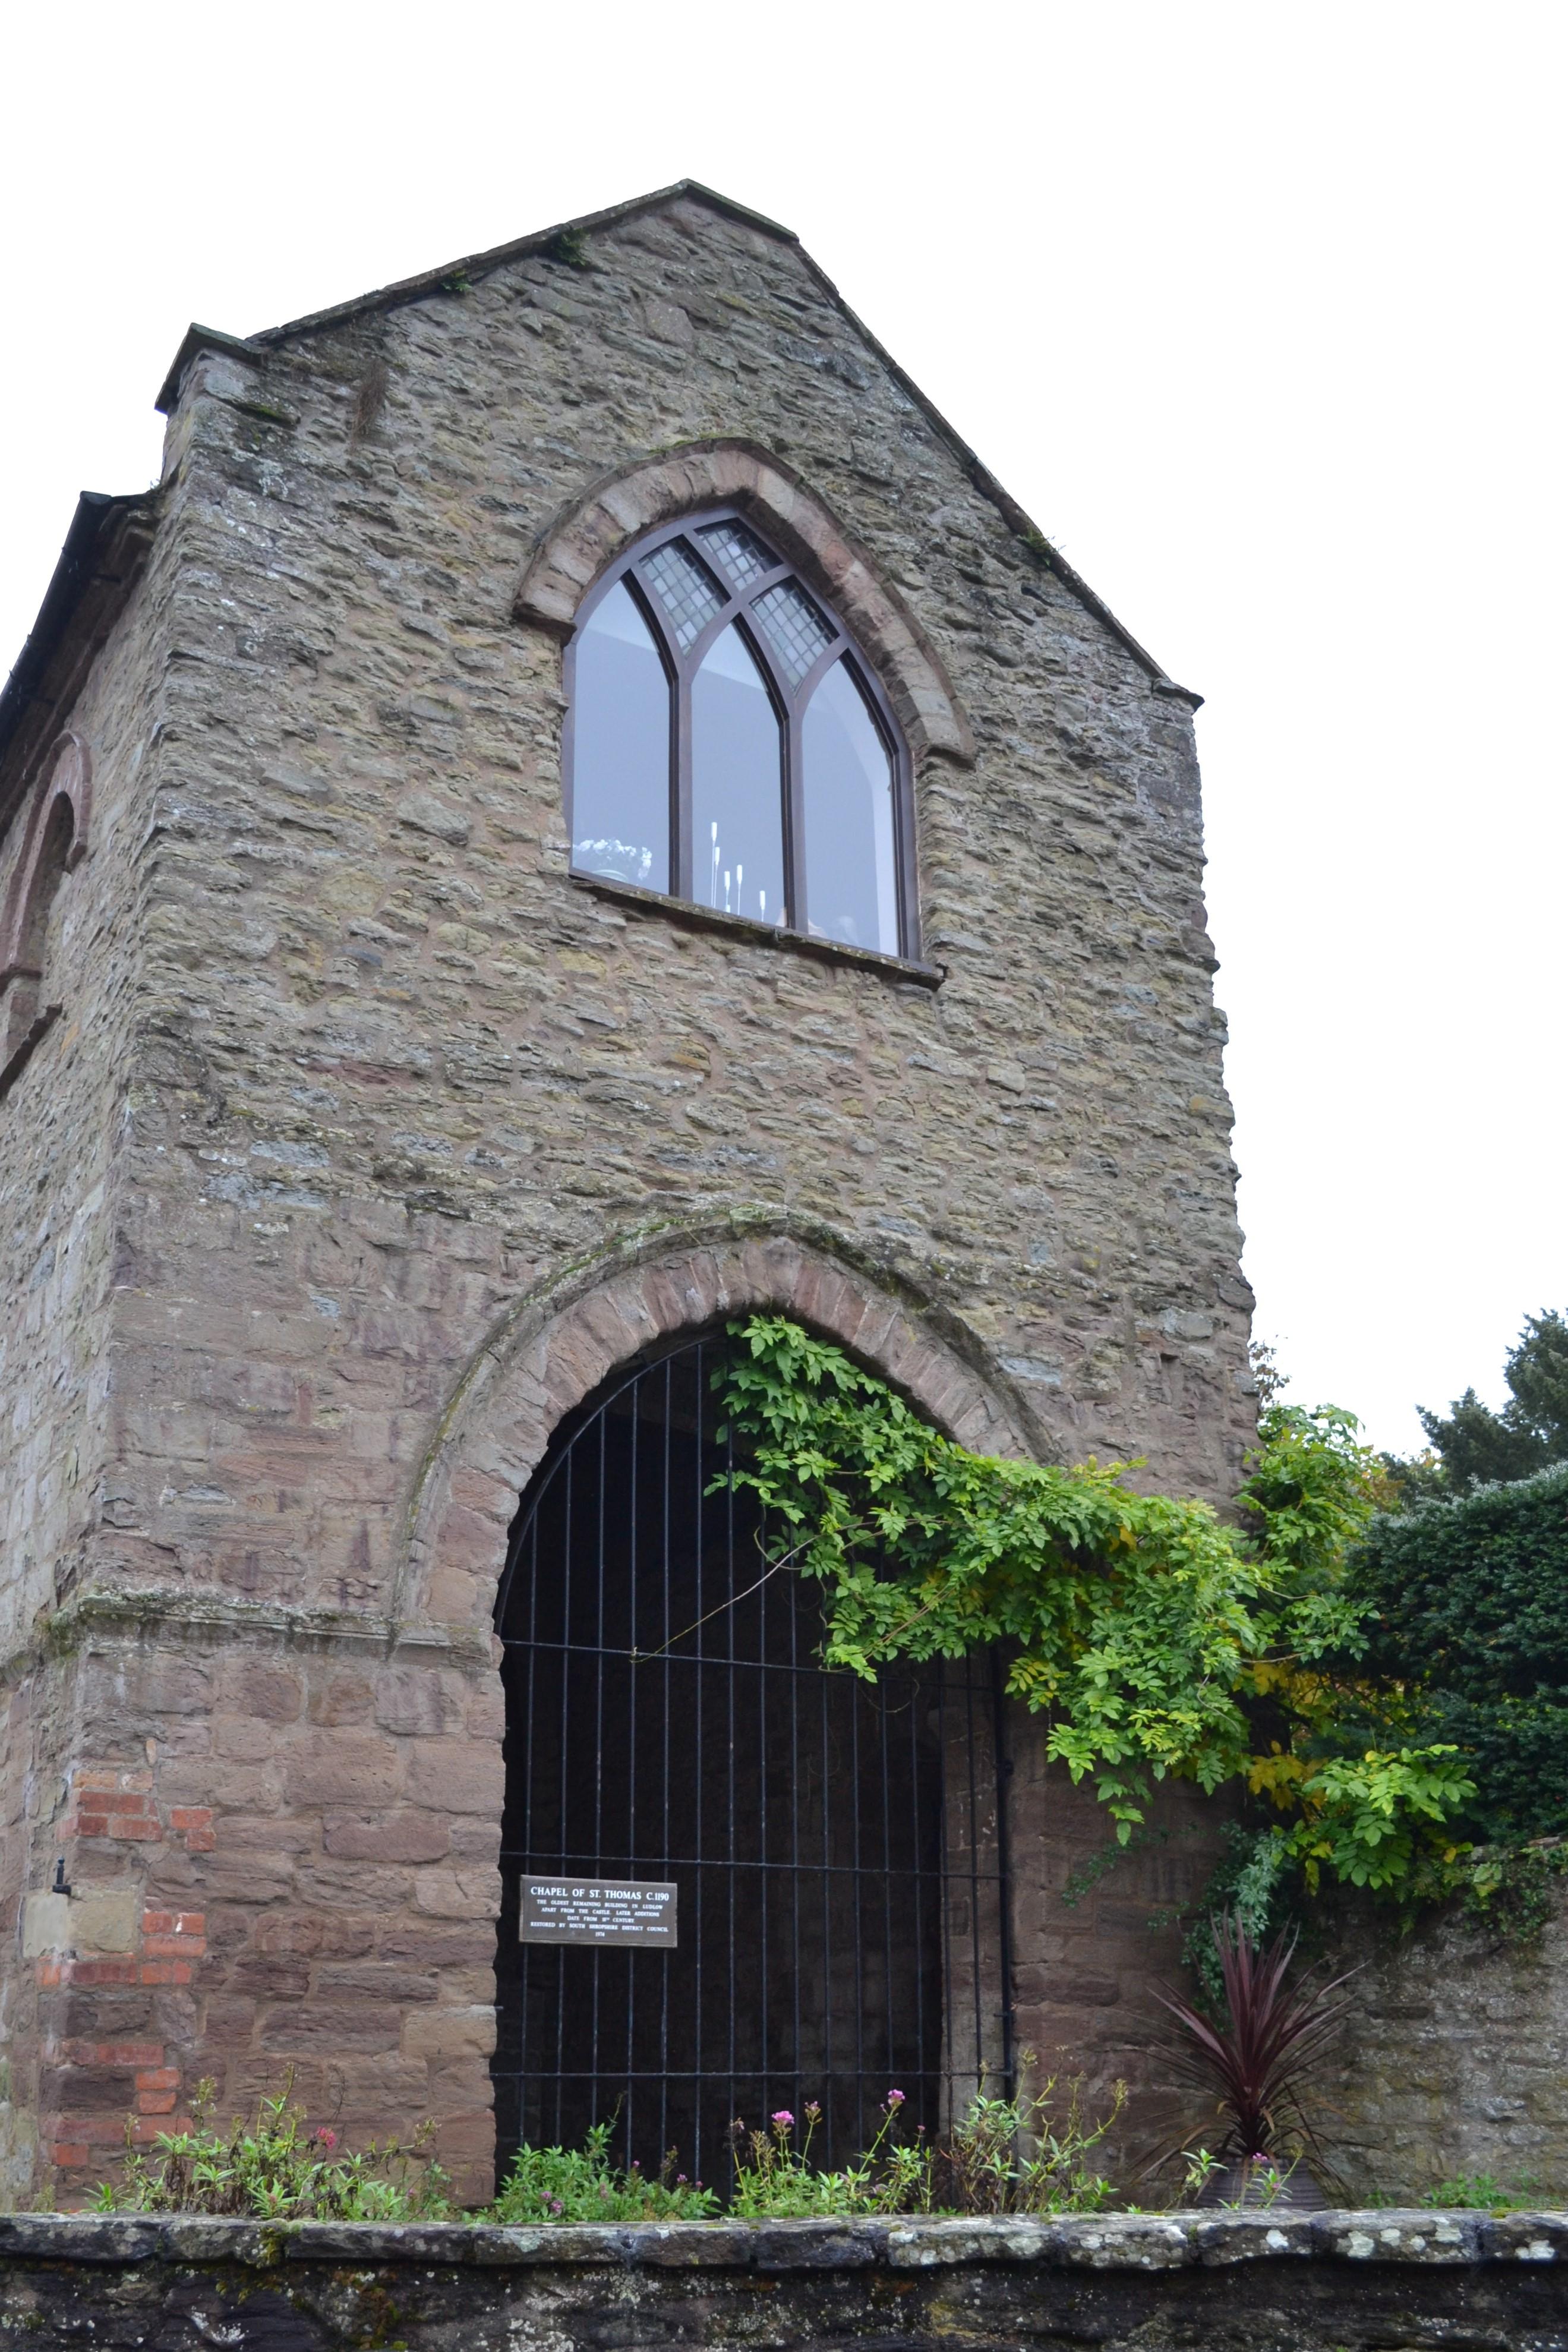 St Thomas's Chapel, Ludlow